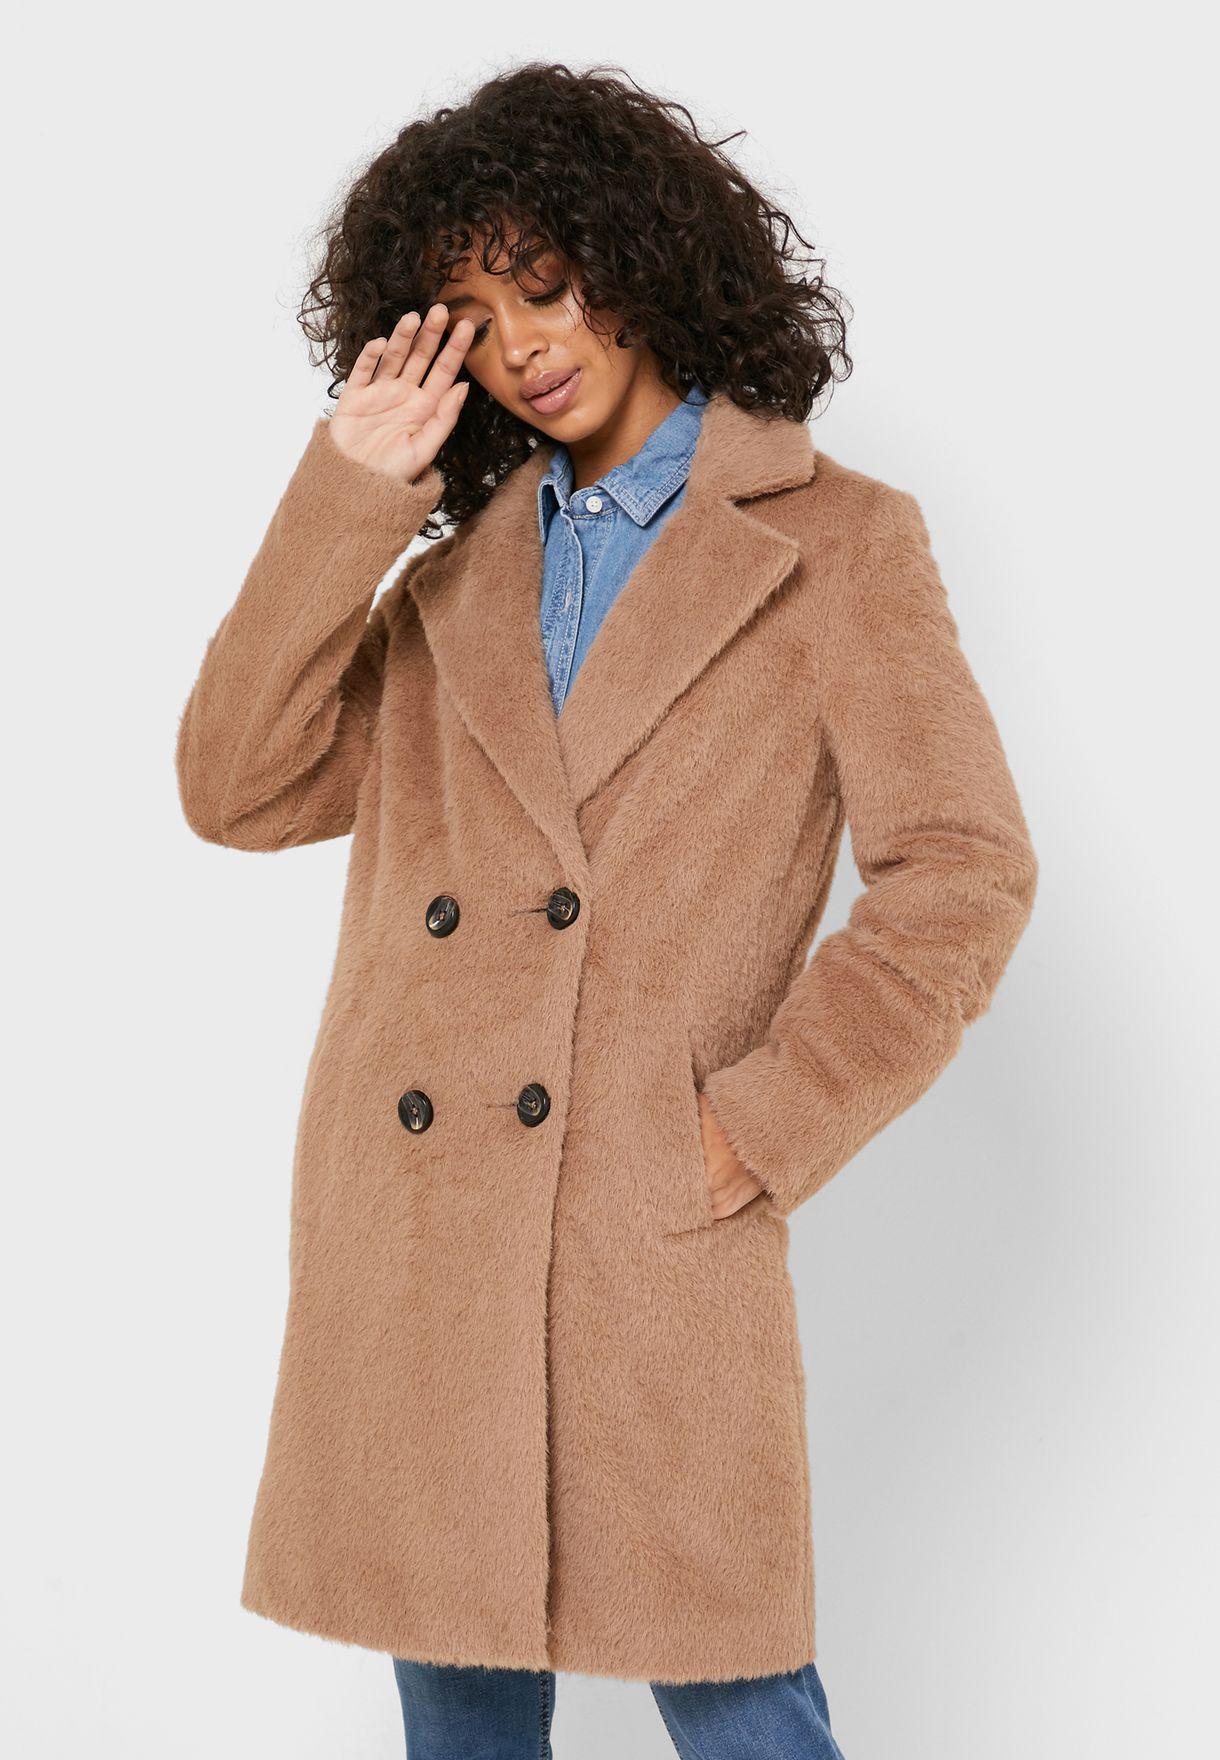 معطف فرو بجيوب